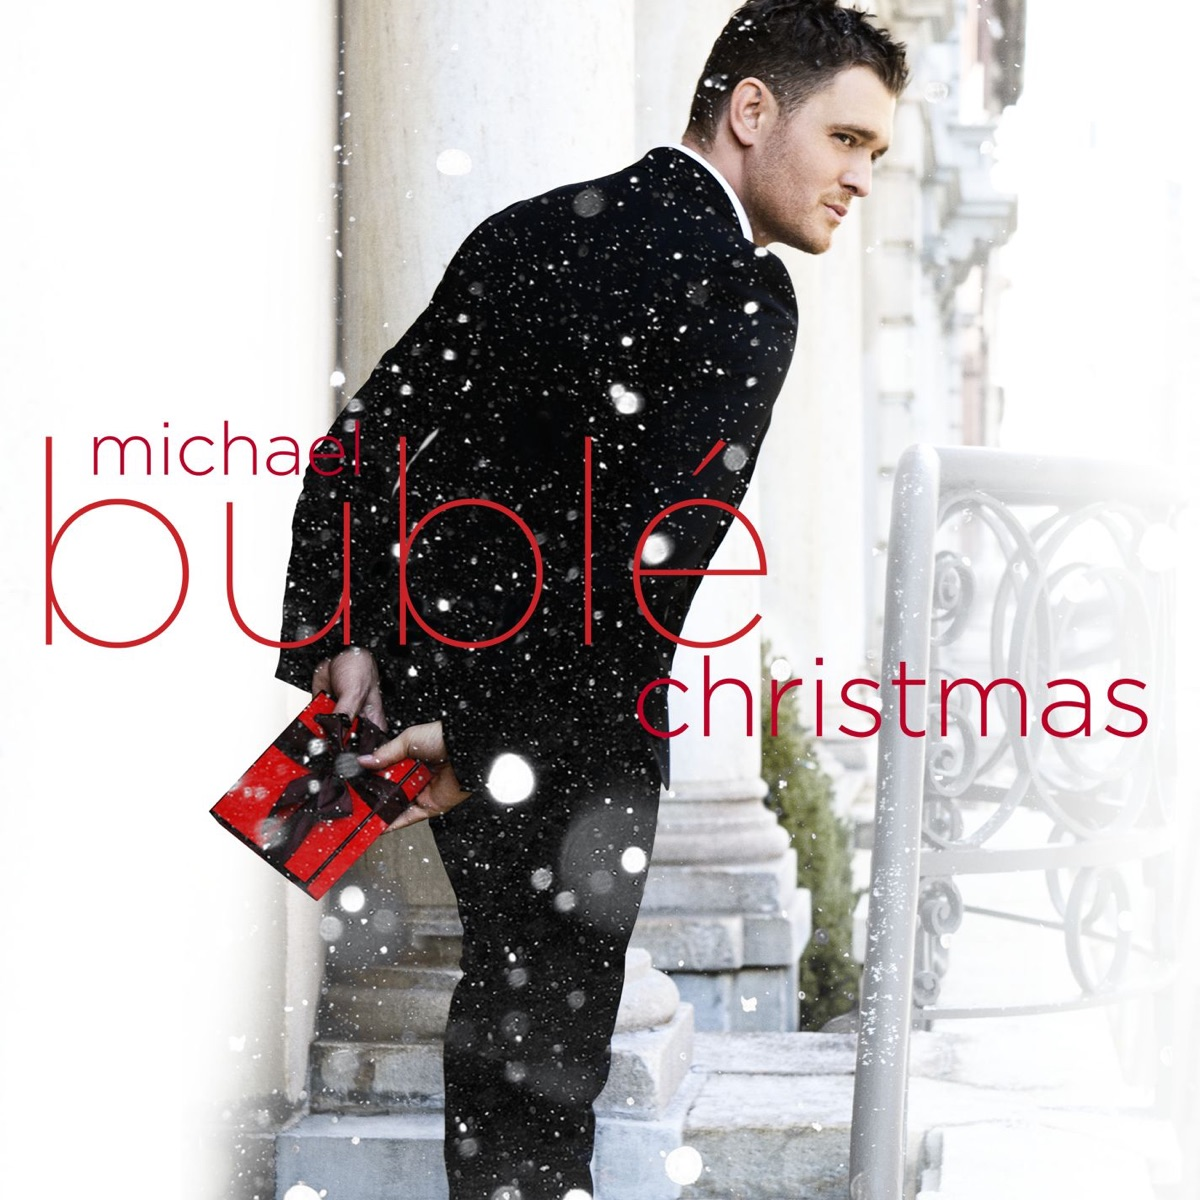 Christmas Michael Bublé CD cover